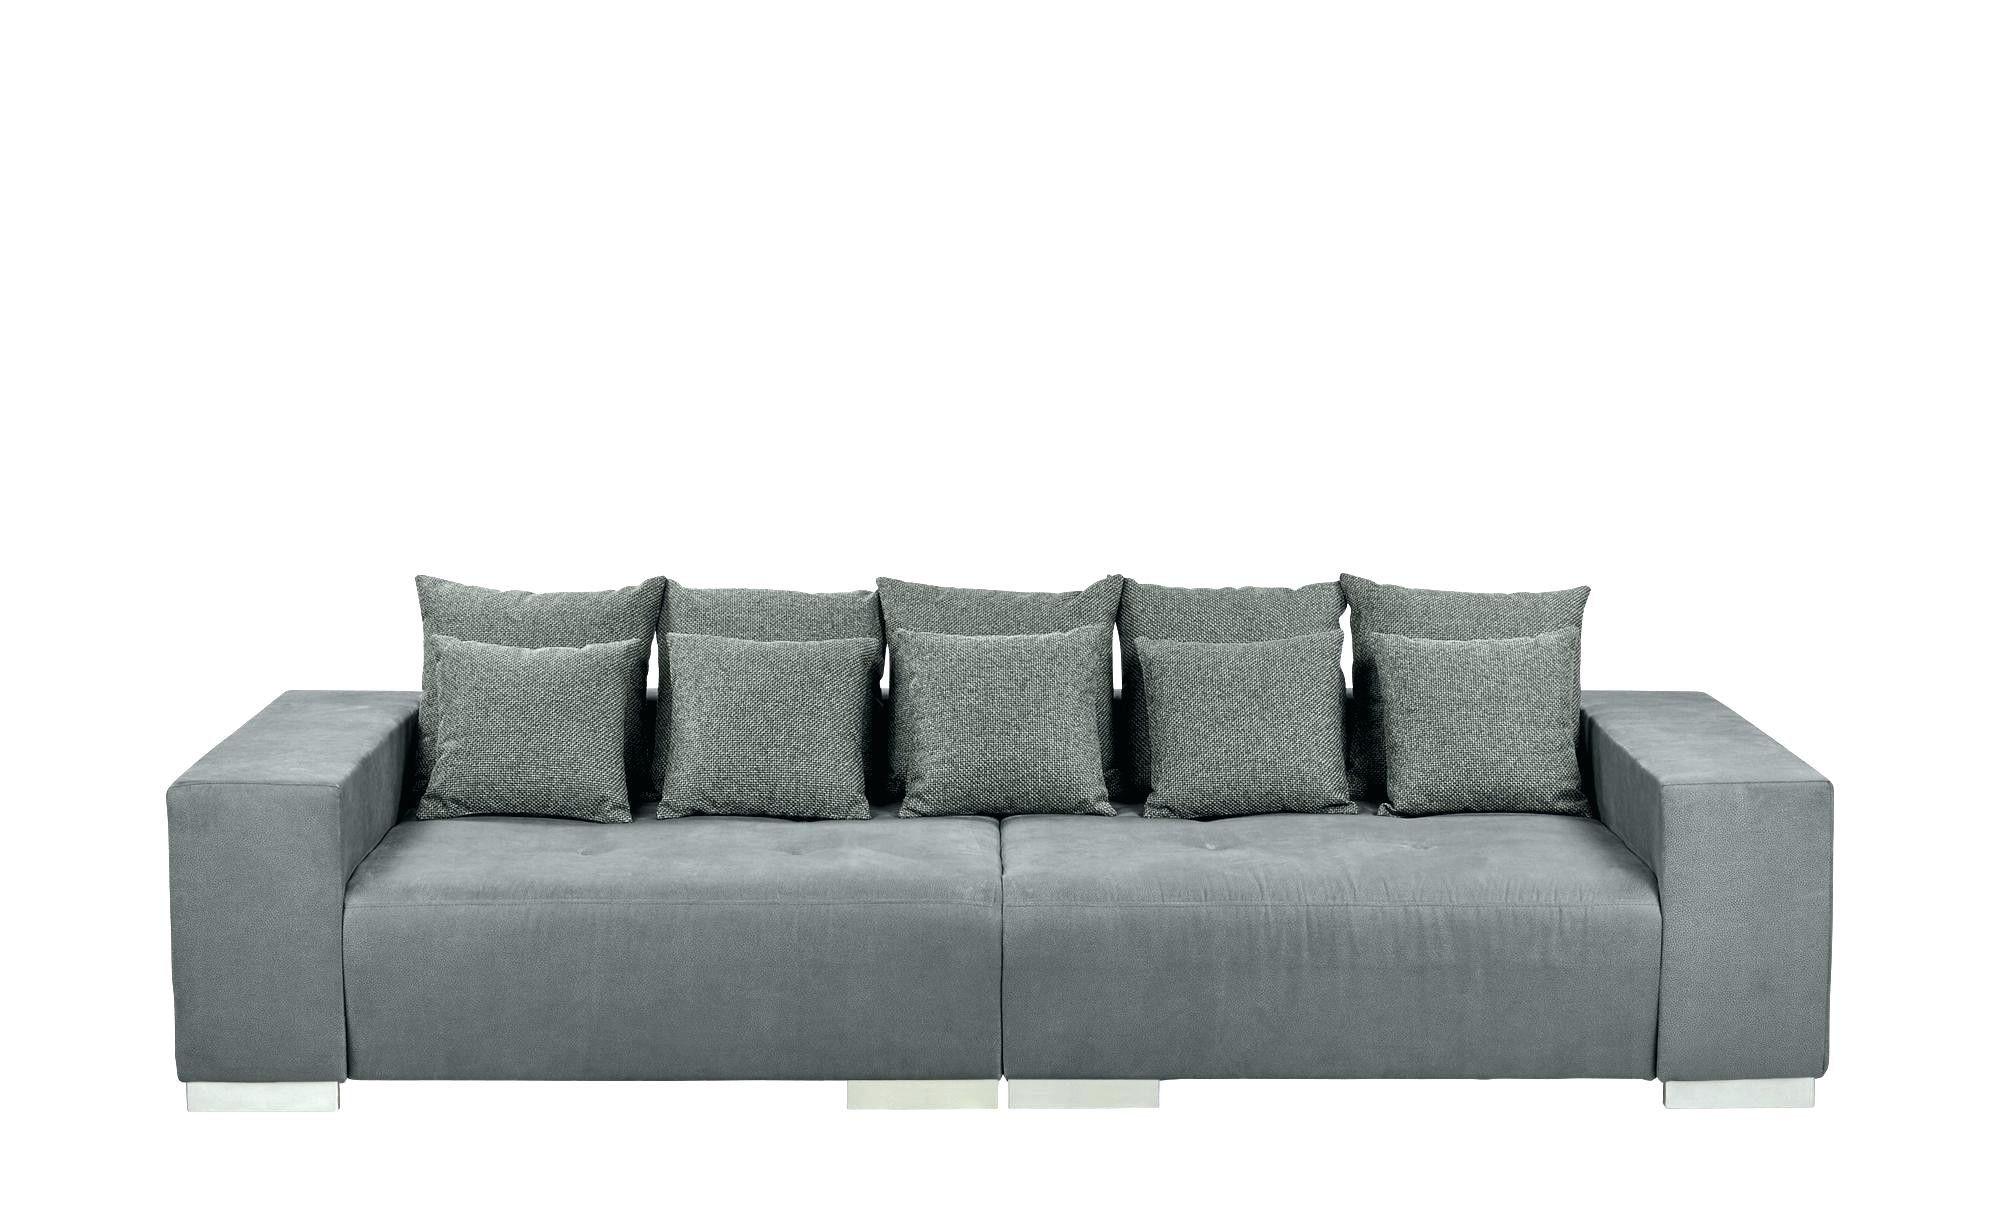 Outstanding Big Sofa Xxl Poco In 2020 Big Sofas Sofa Couch